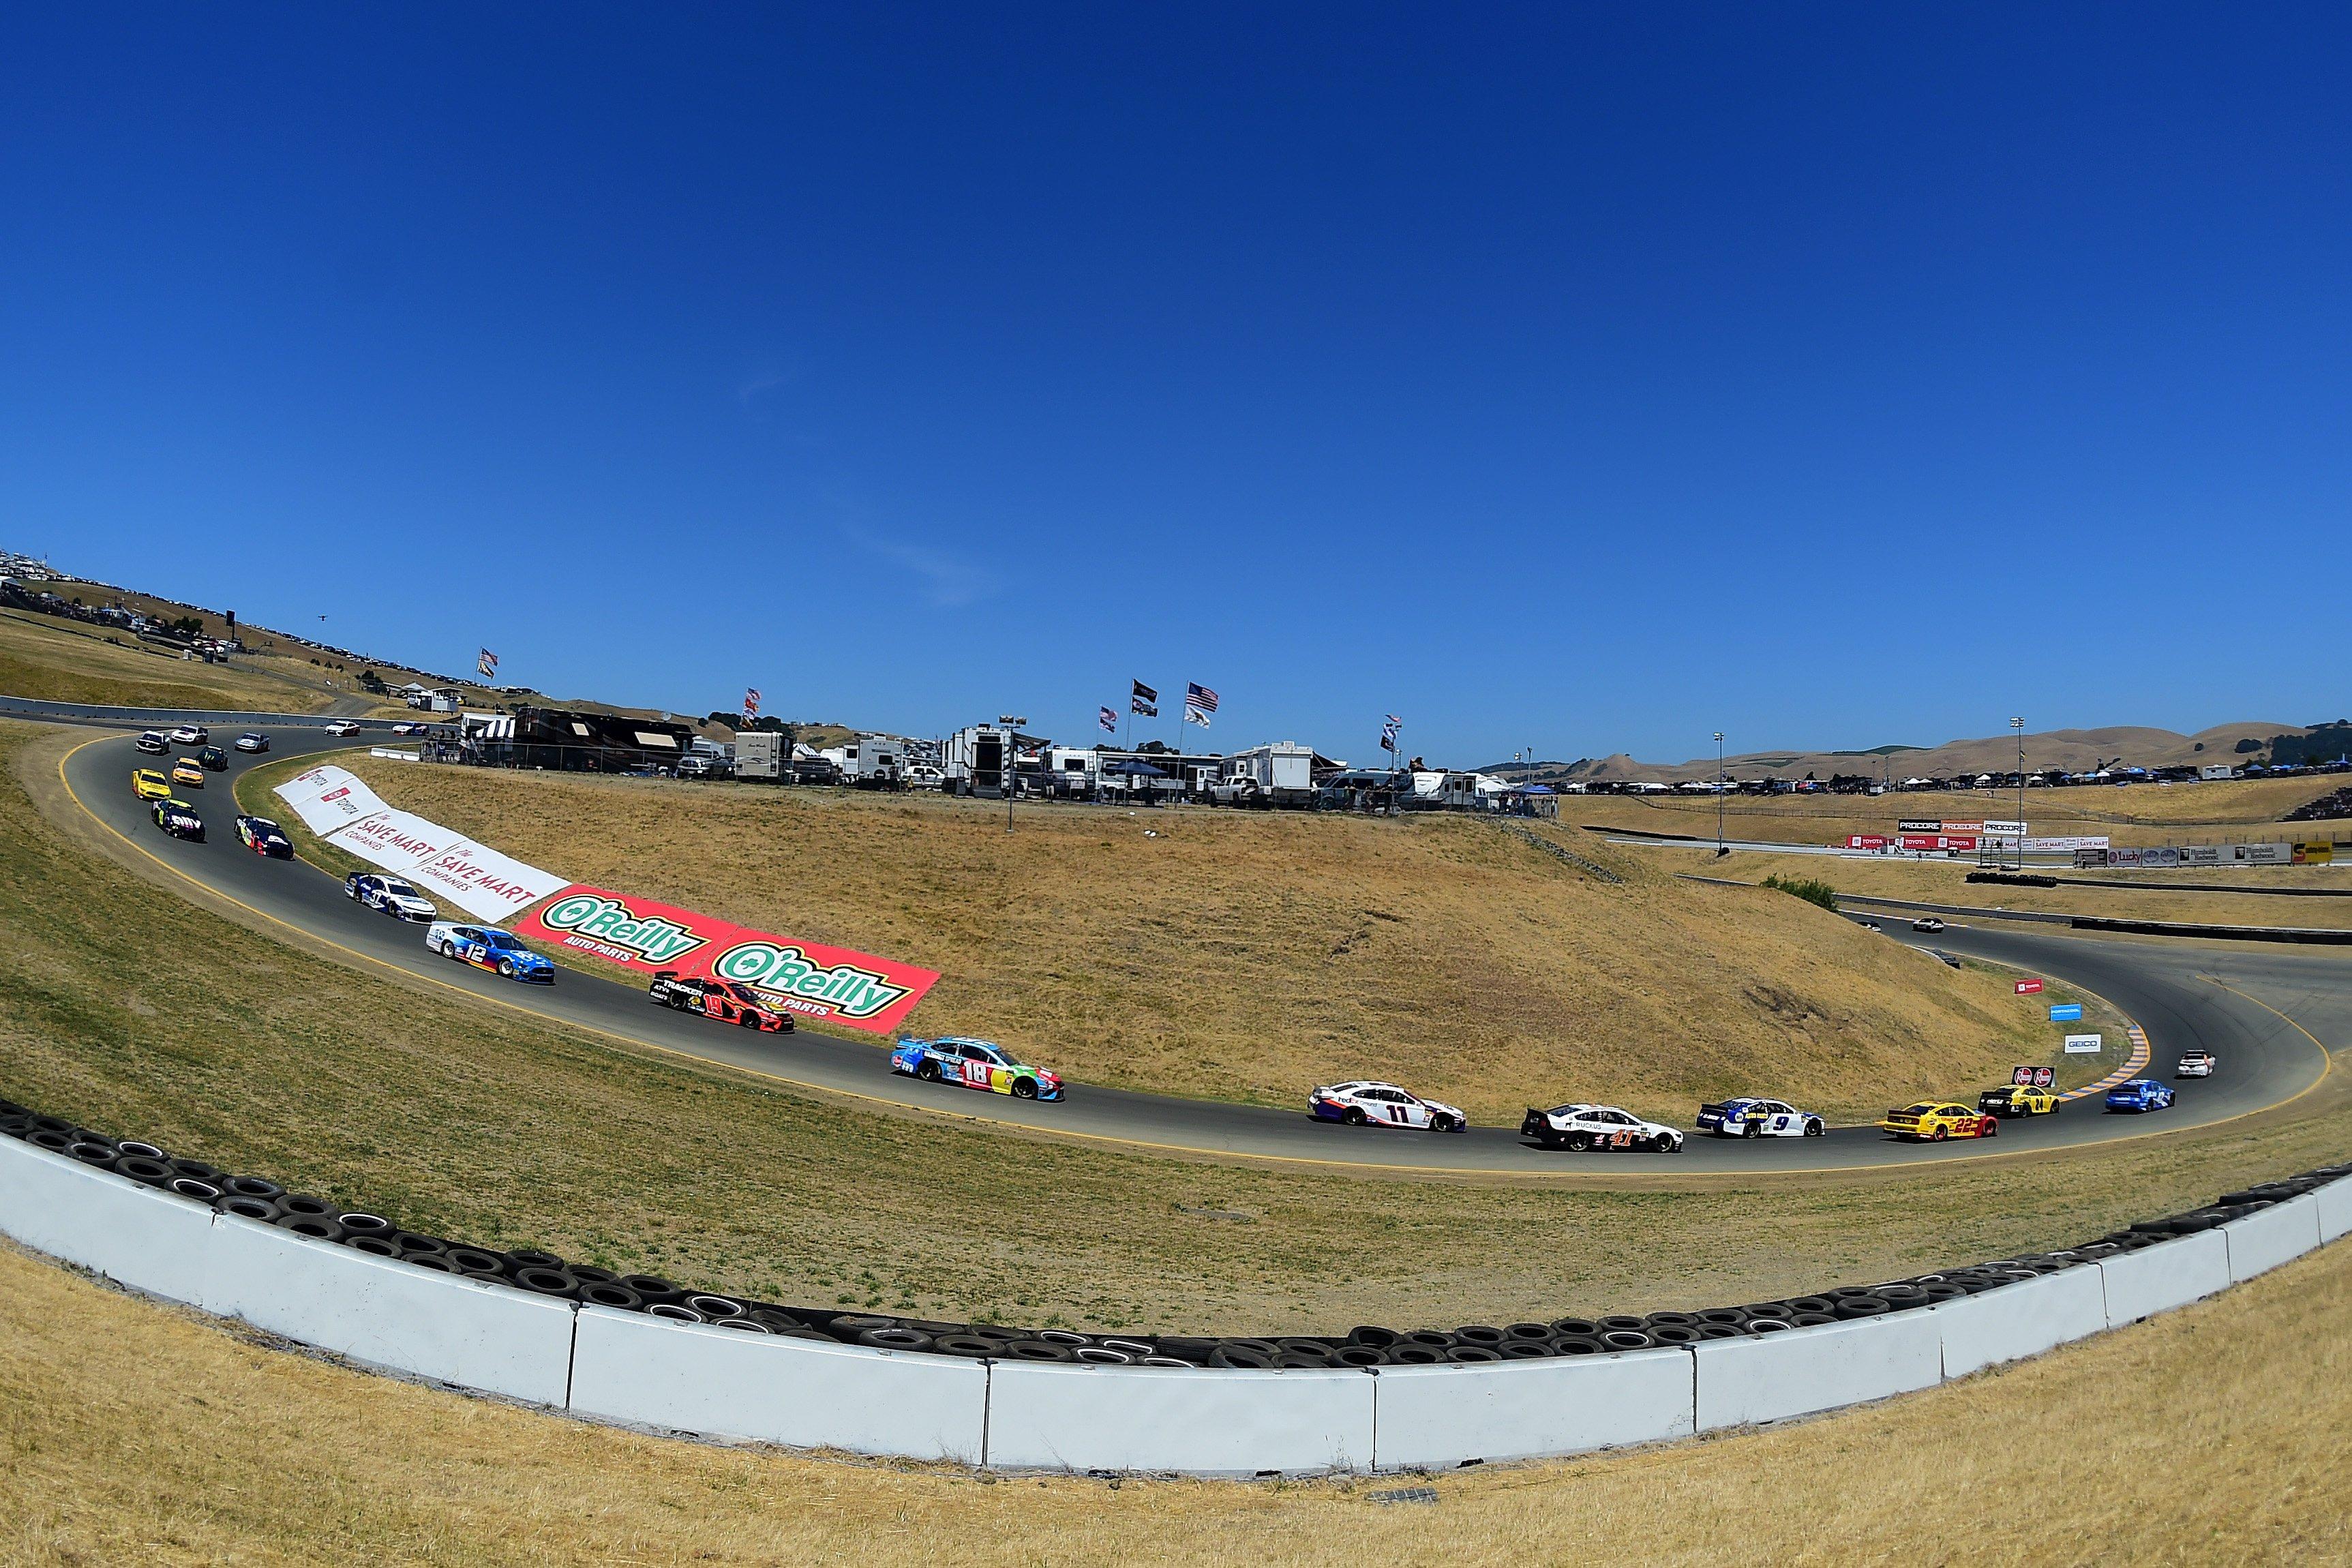 The Carousel at Sonoma Raceway - NASCAR Cup Series